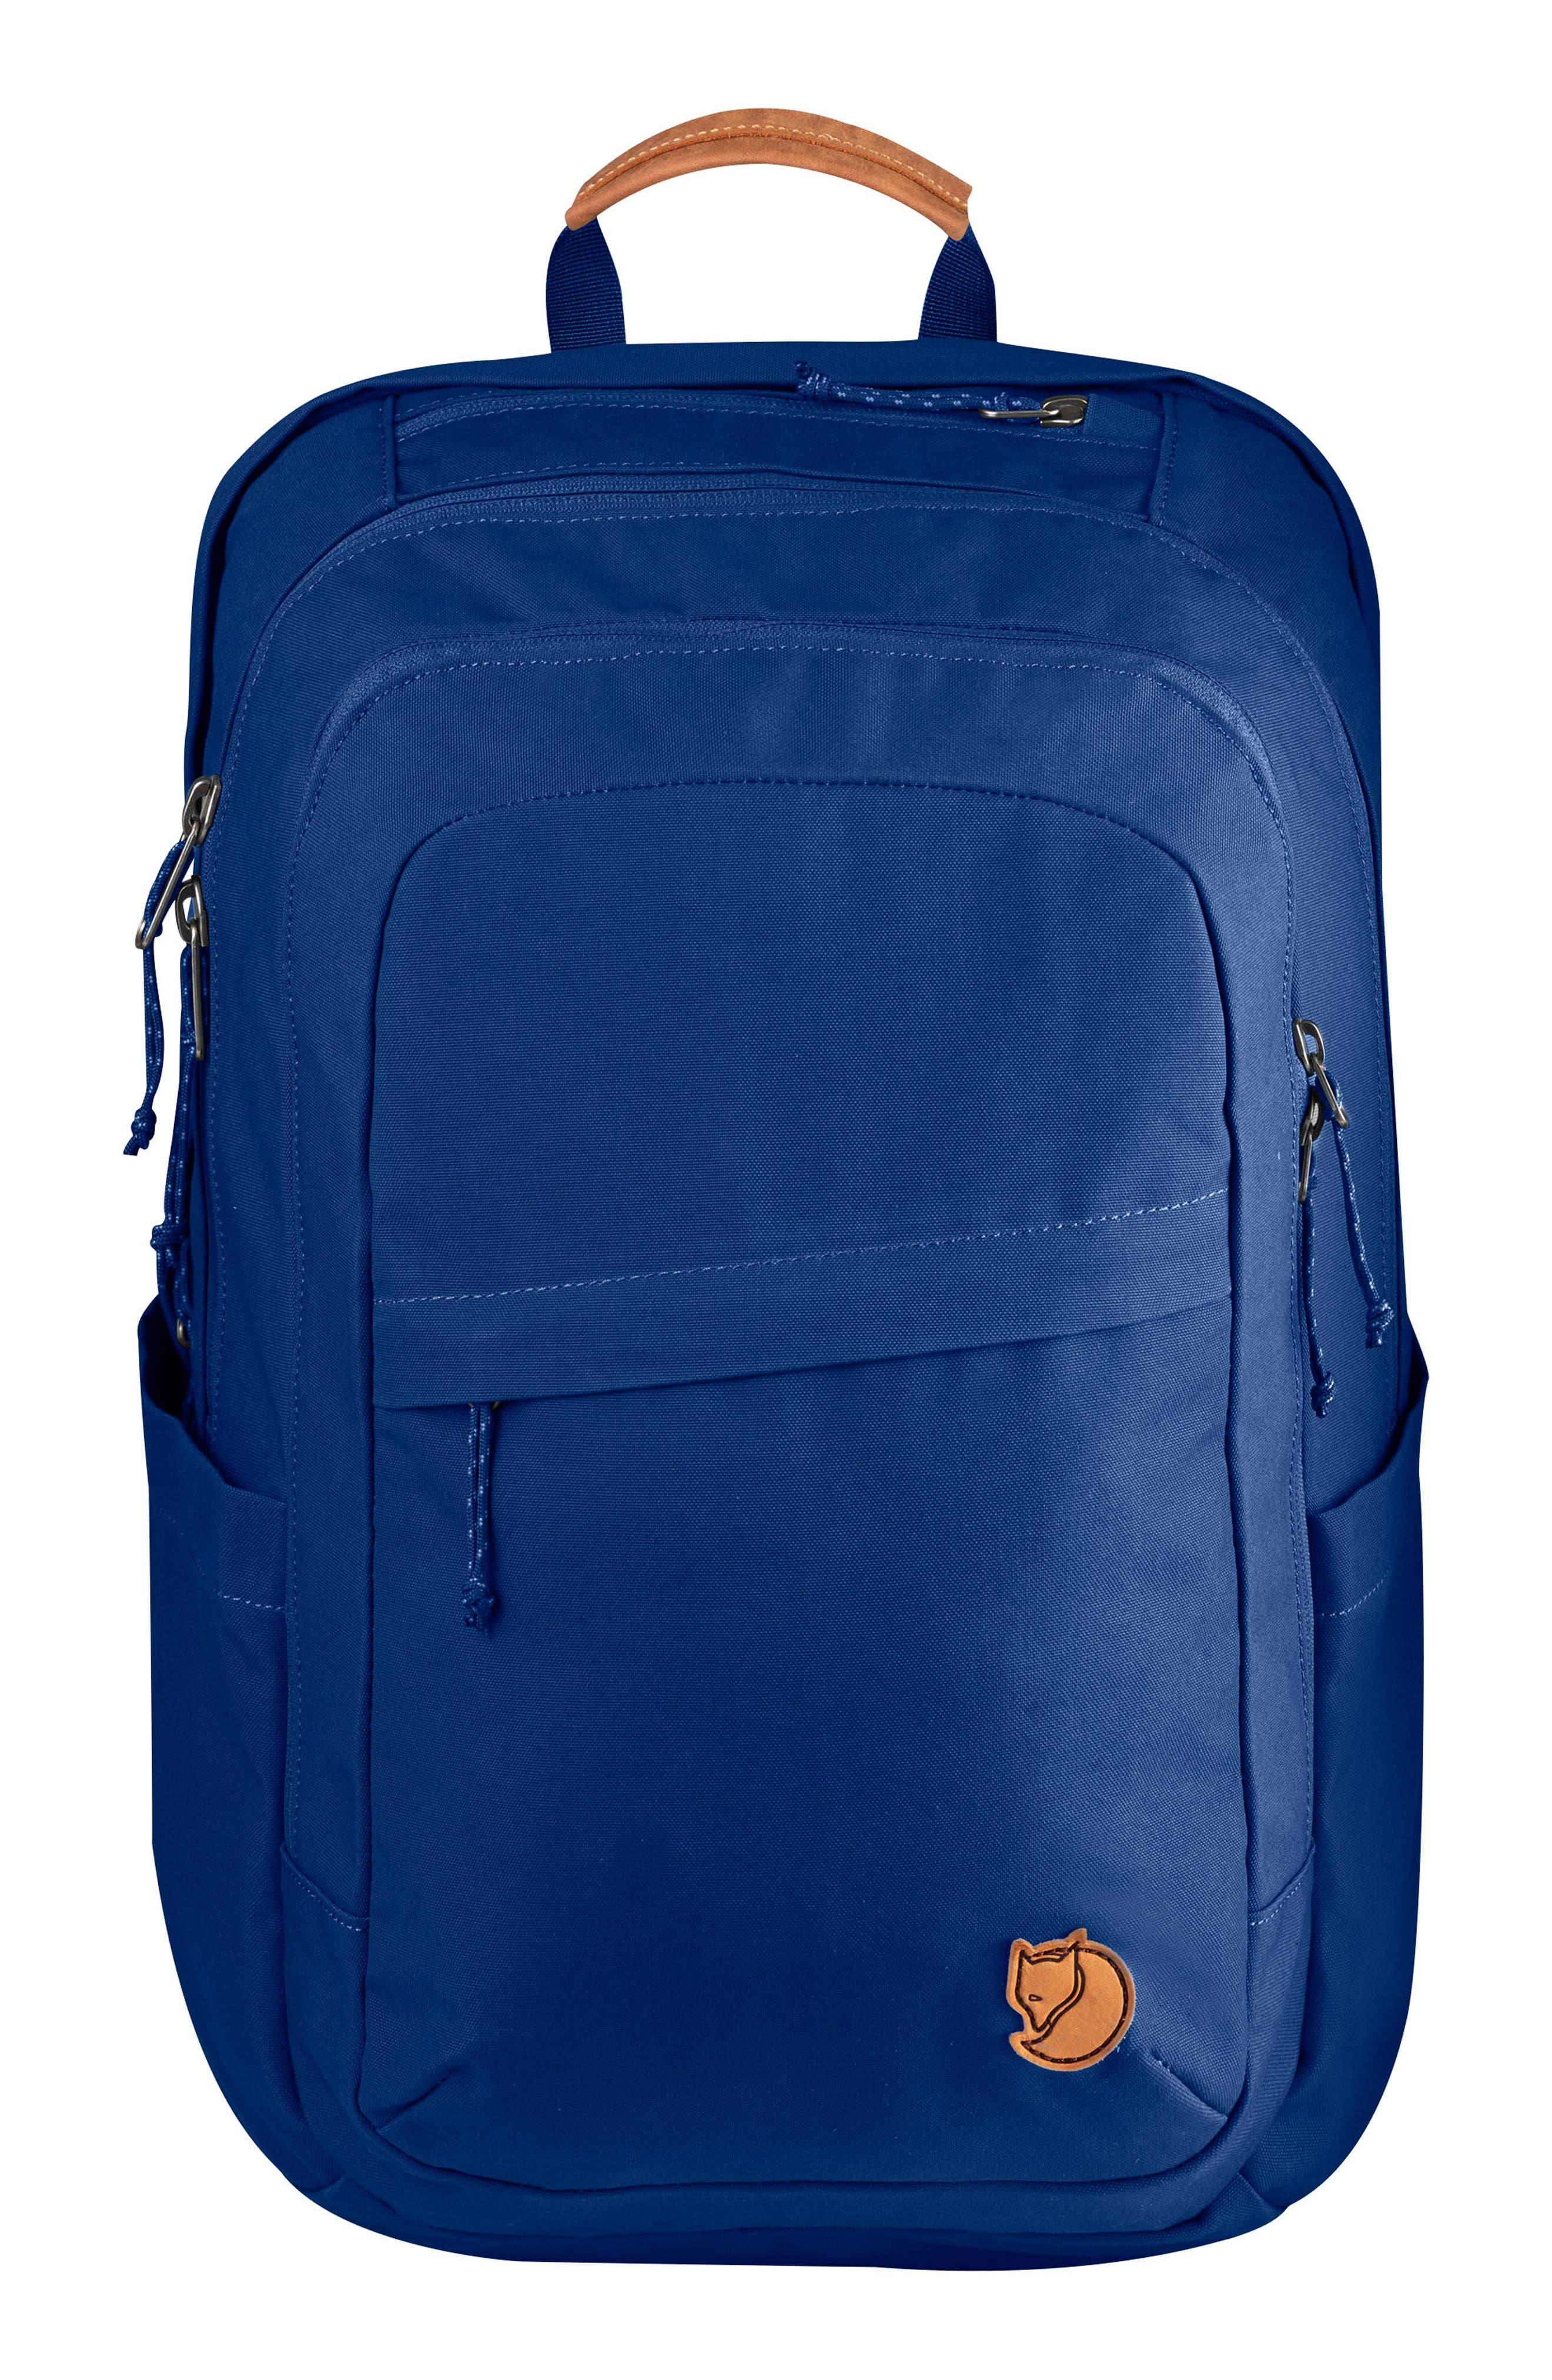 'Raven 28L' Backpack,                             Main thumbnail 1, color,                             DEEP BLUE